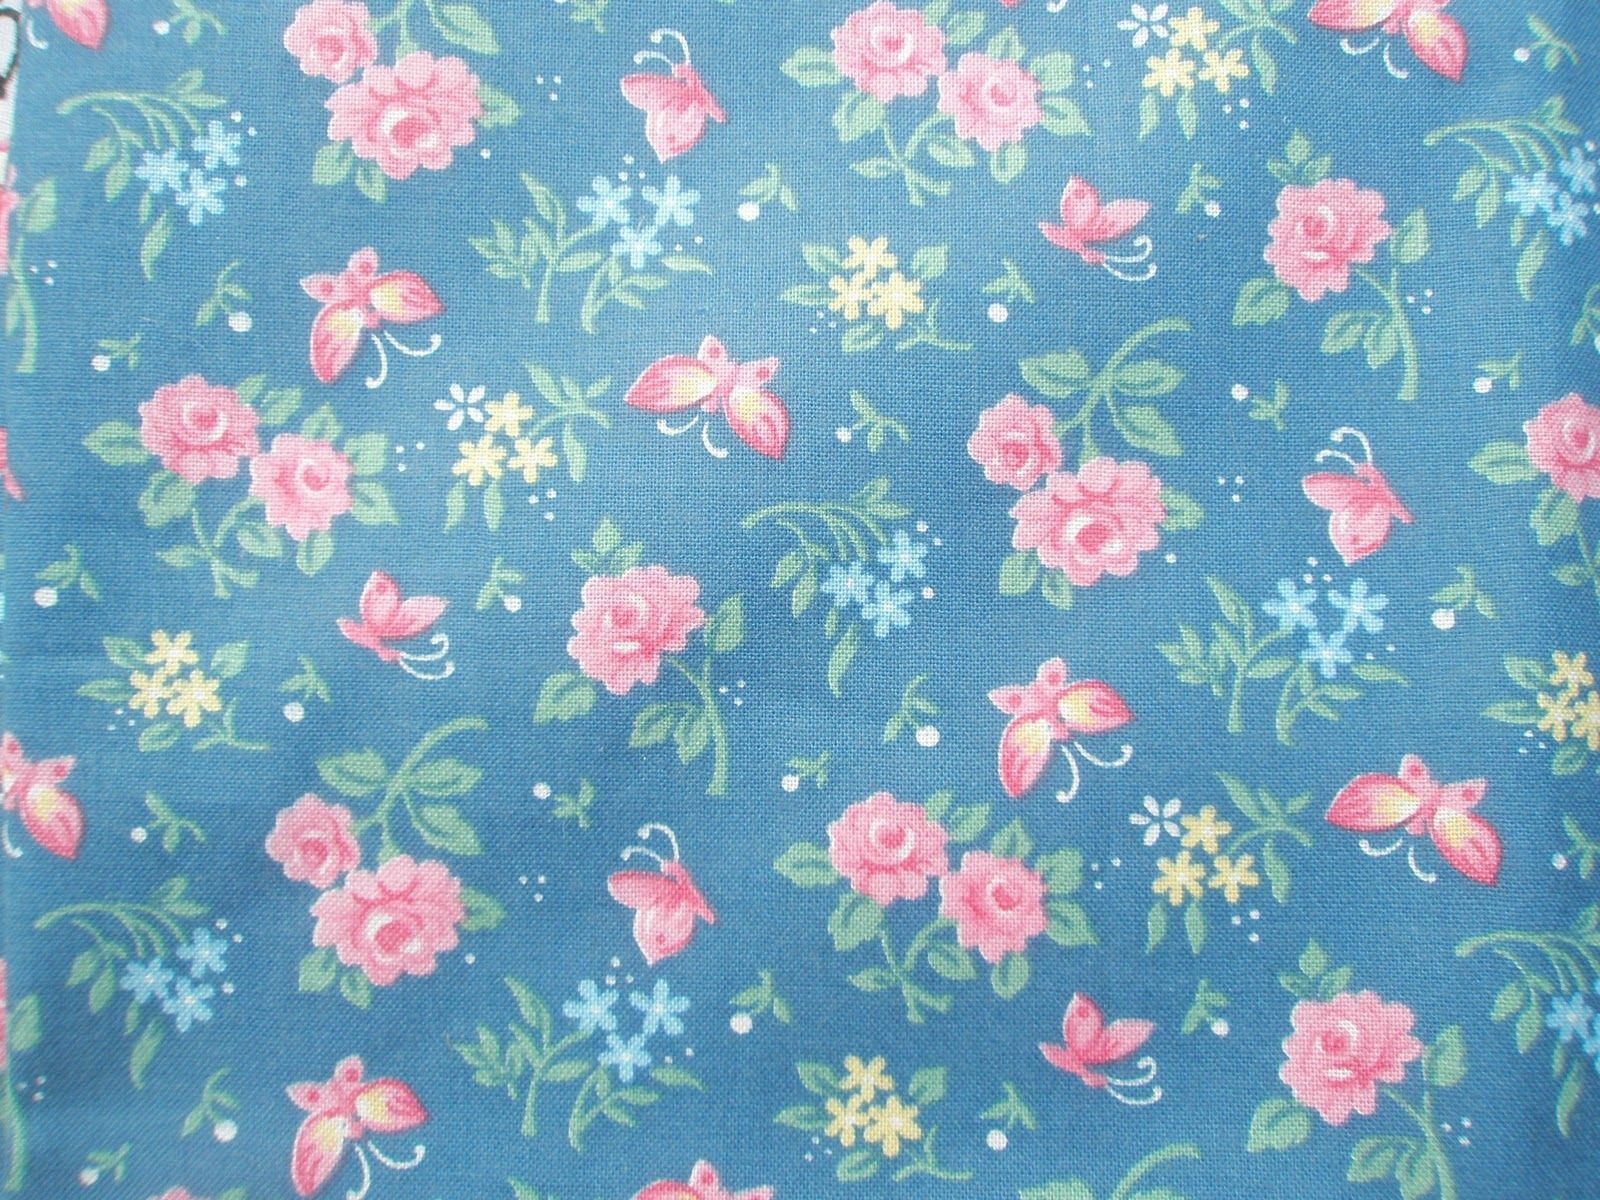 Tumblr Ipad Wallpapers Top Free Tumblr Ipad Backgrounds